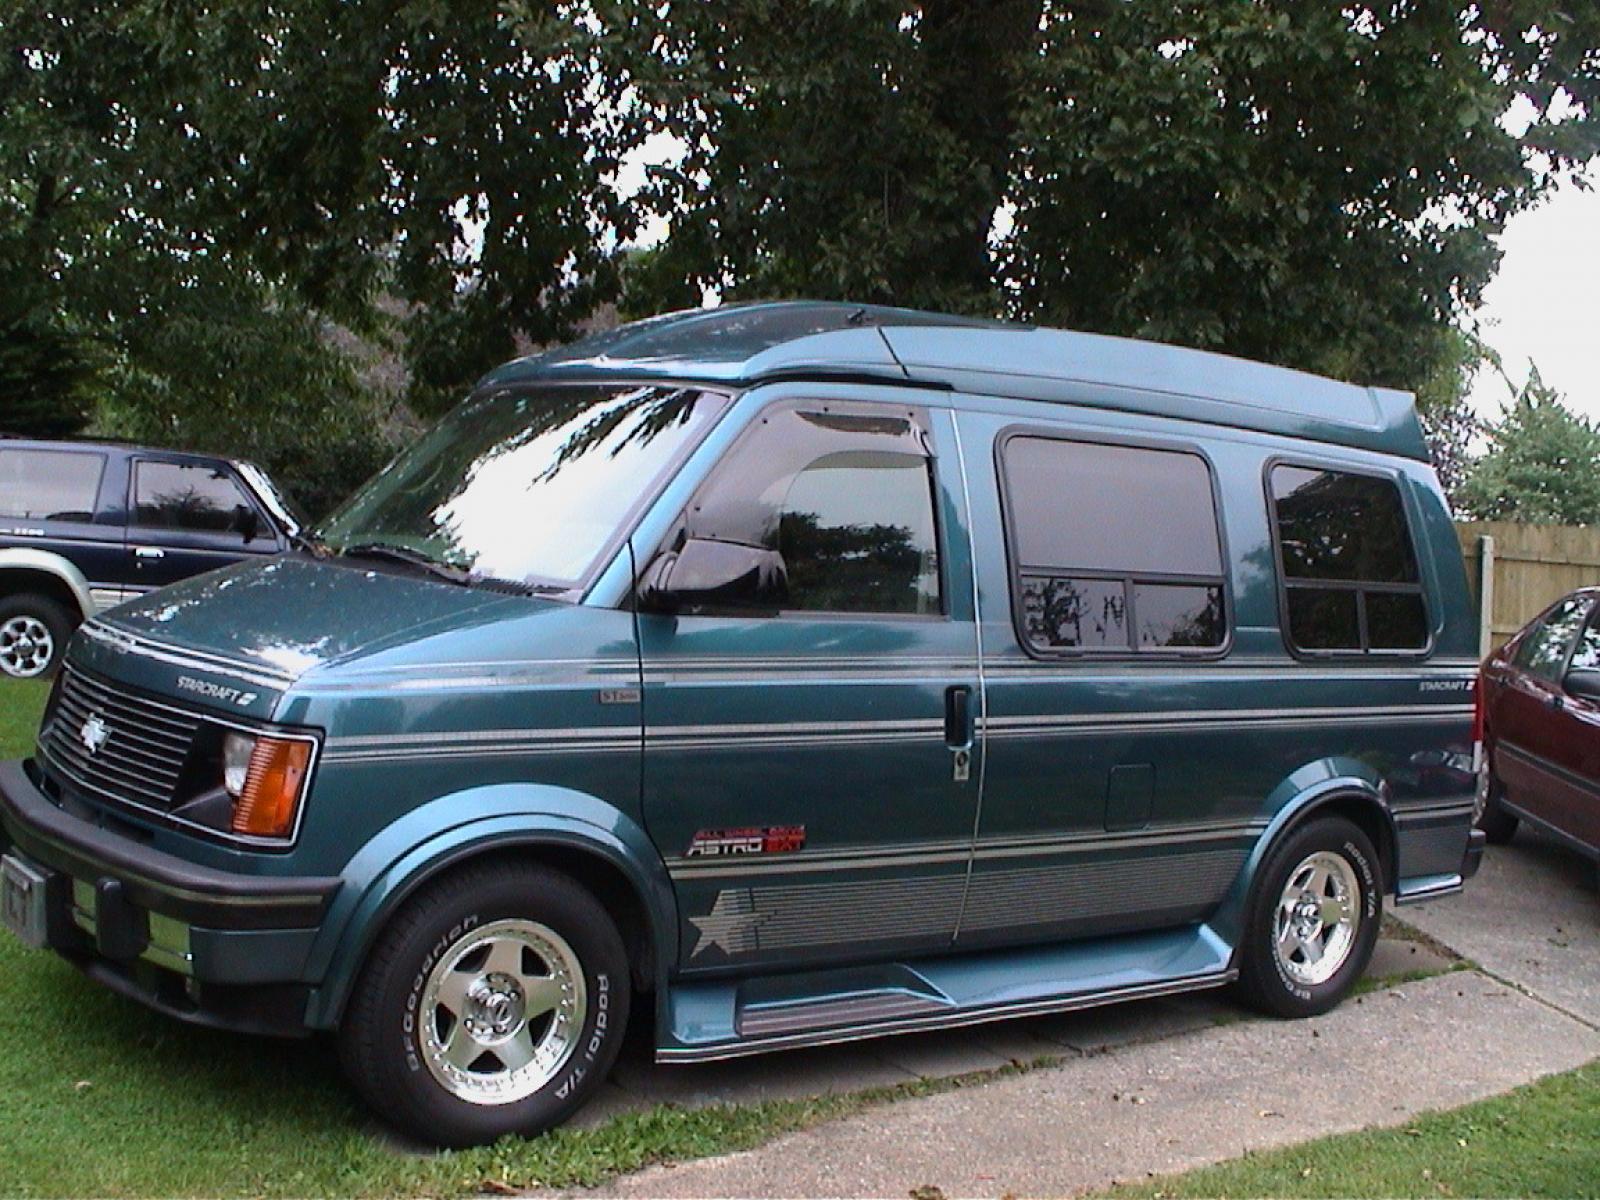 2005 Chevy Astro Van Vacuum Diagram Detailed Schematics Pick Up Wiring Diagrams Automotive 1996 Chevrolet Reveolution Of U2022 Firing Order